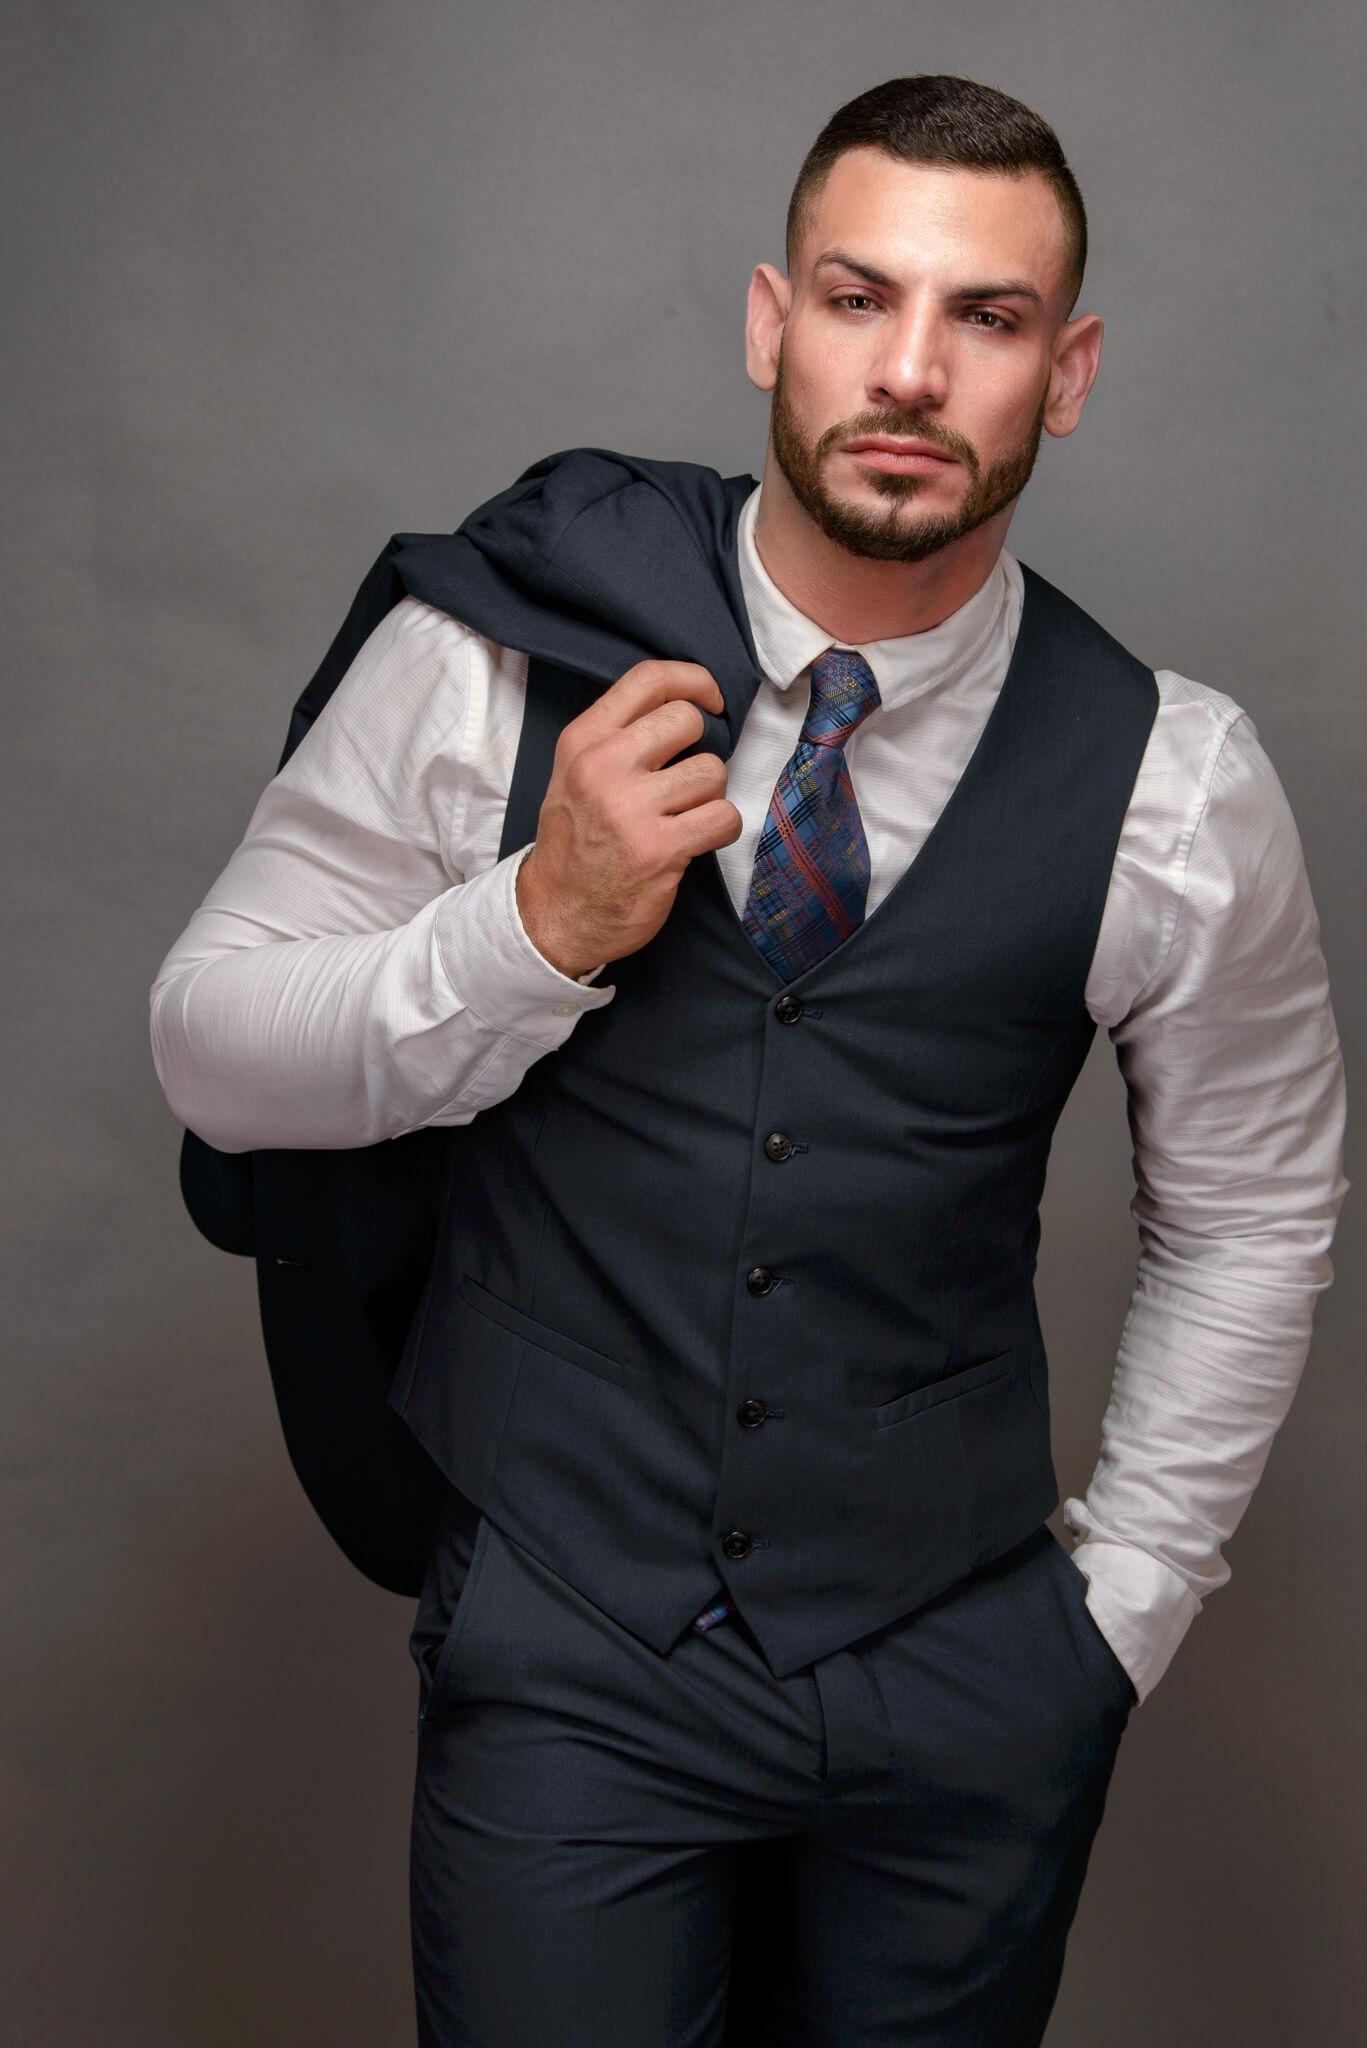 Alejandro's Business Lifestyle 4